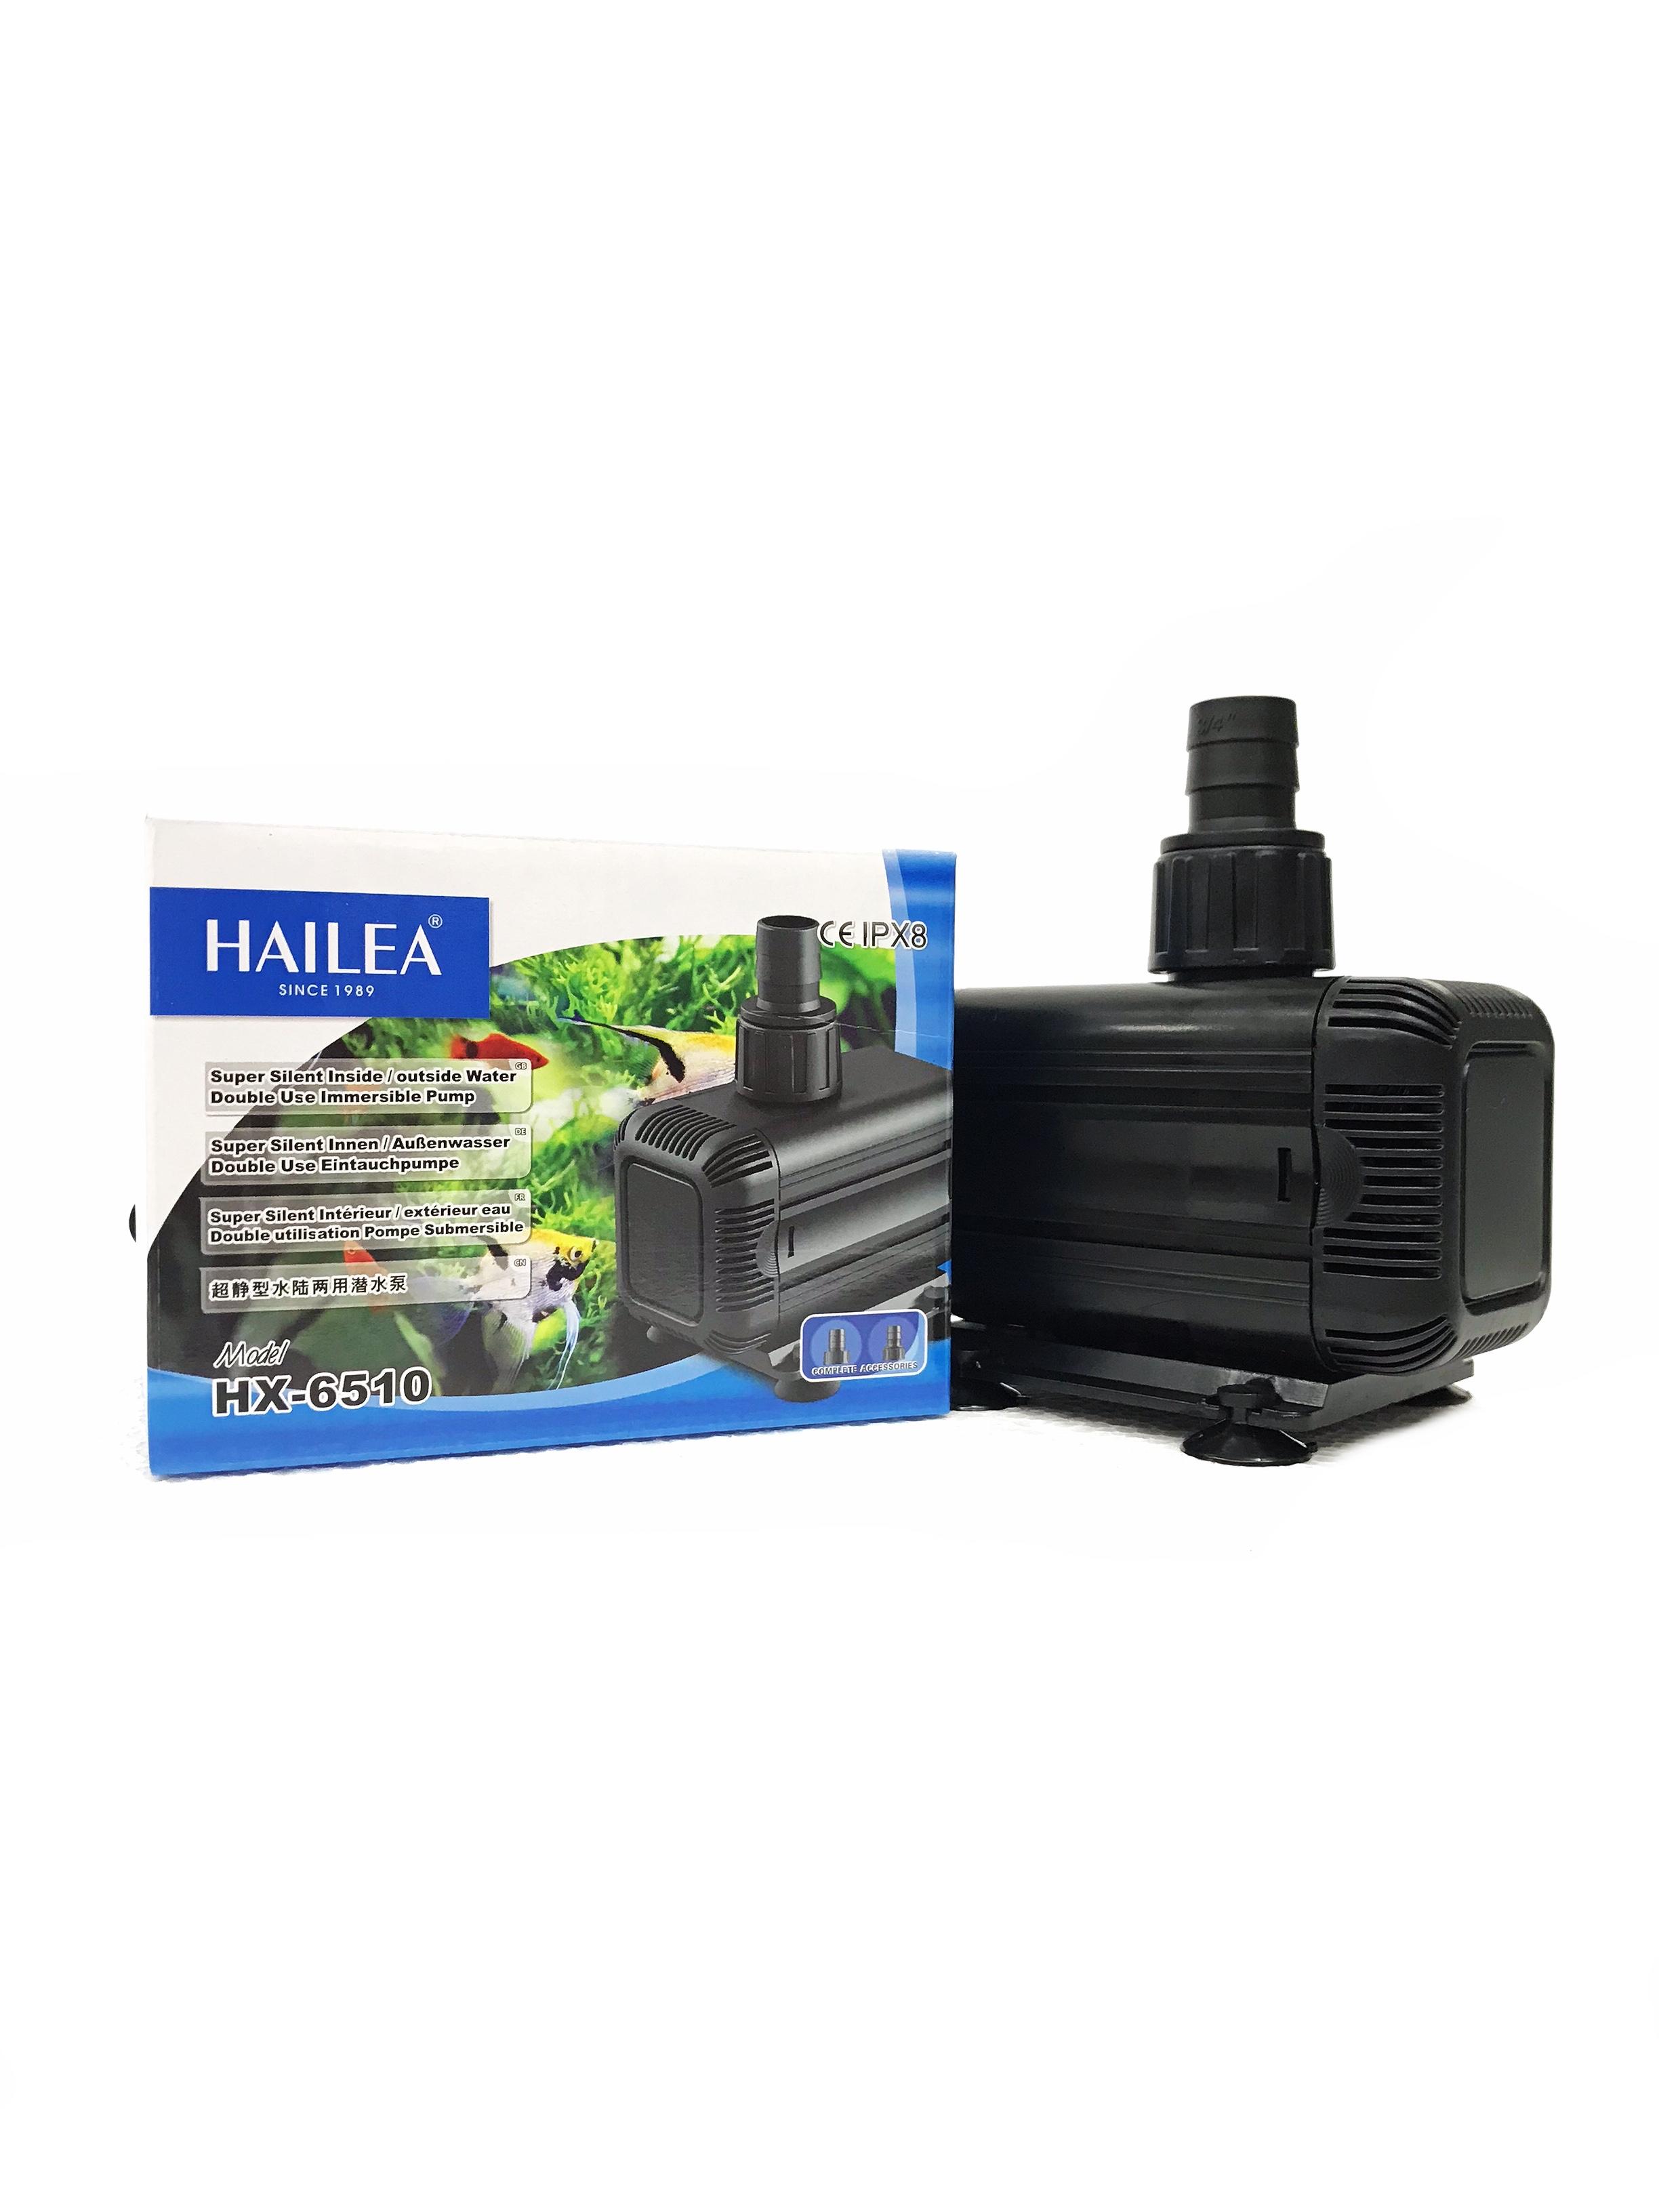 Hailea Wet & Dry Pump